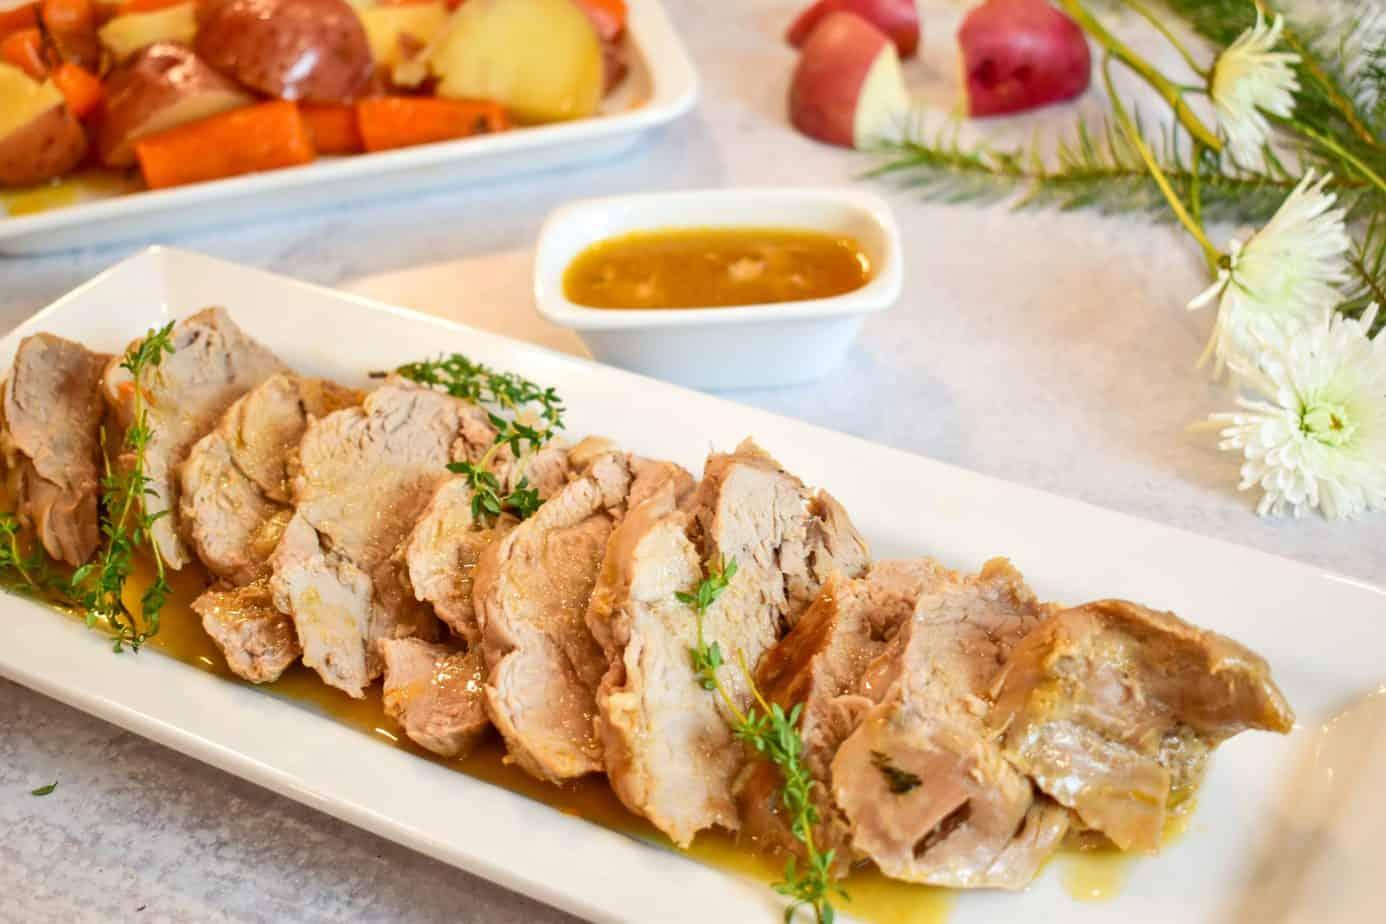 pork tenderloin, pork, ninja foodi pork, instant pot pork, carrots, potatoes